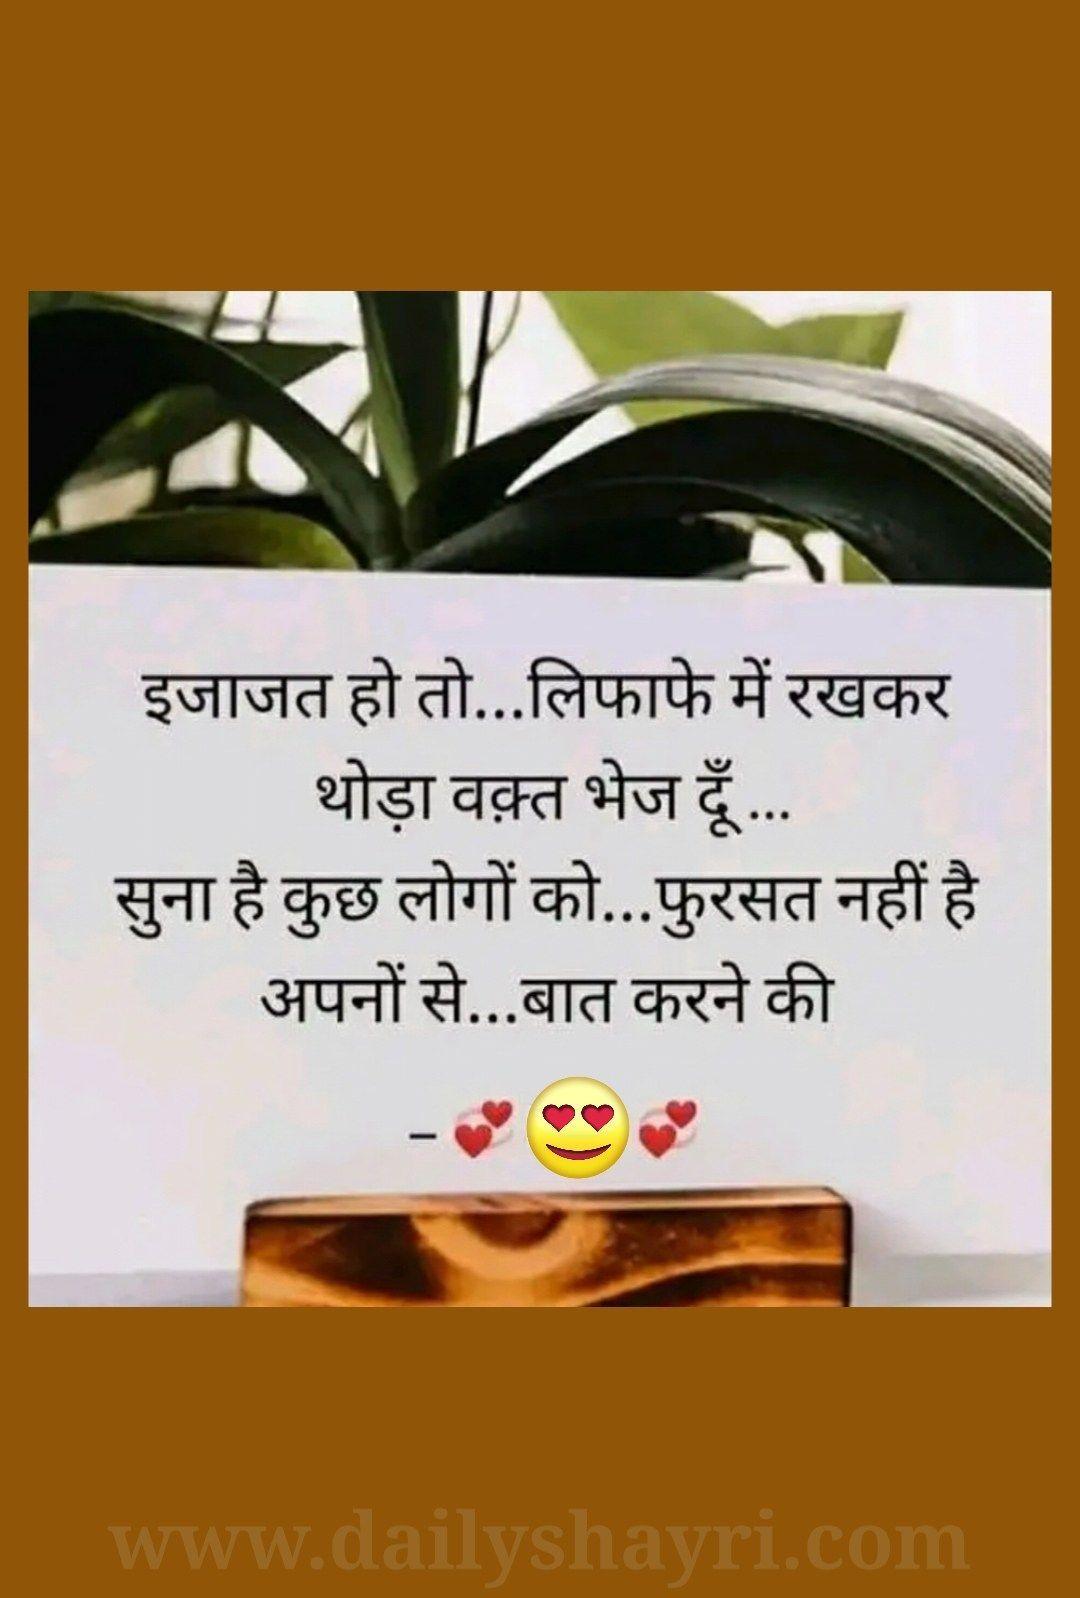 2020 good morning shayari images hindi shayari love